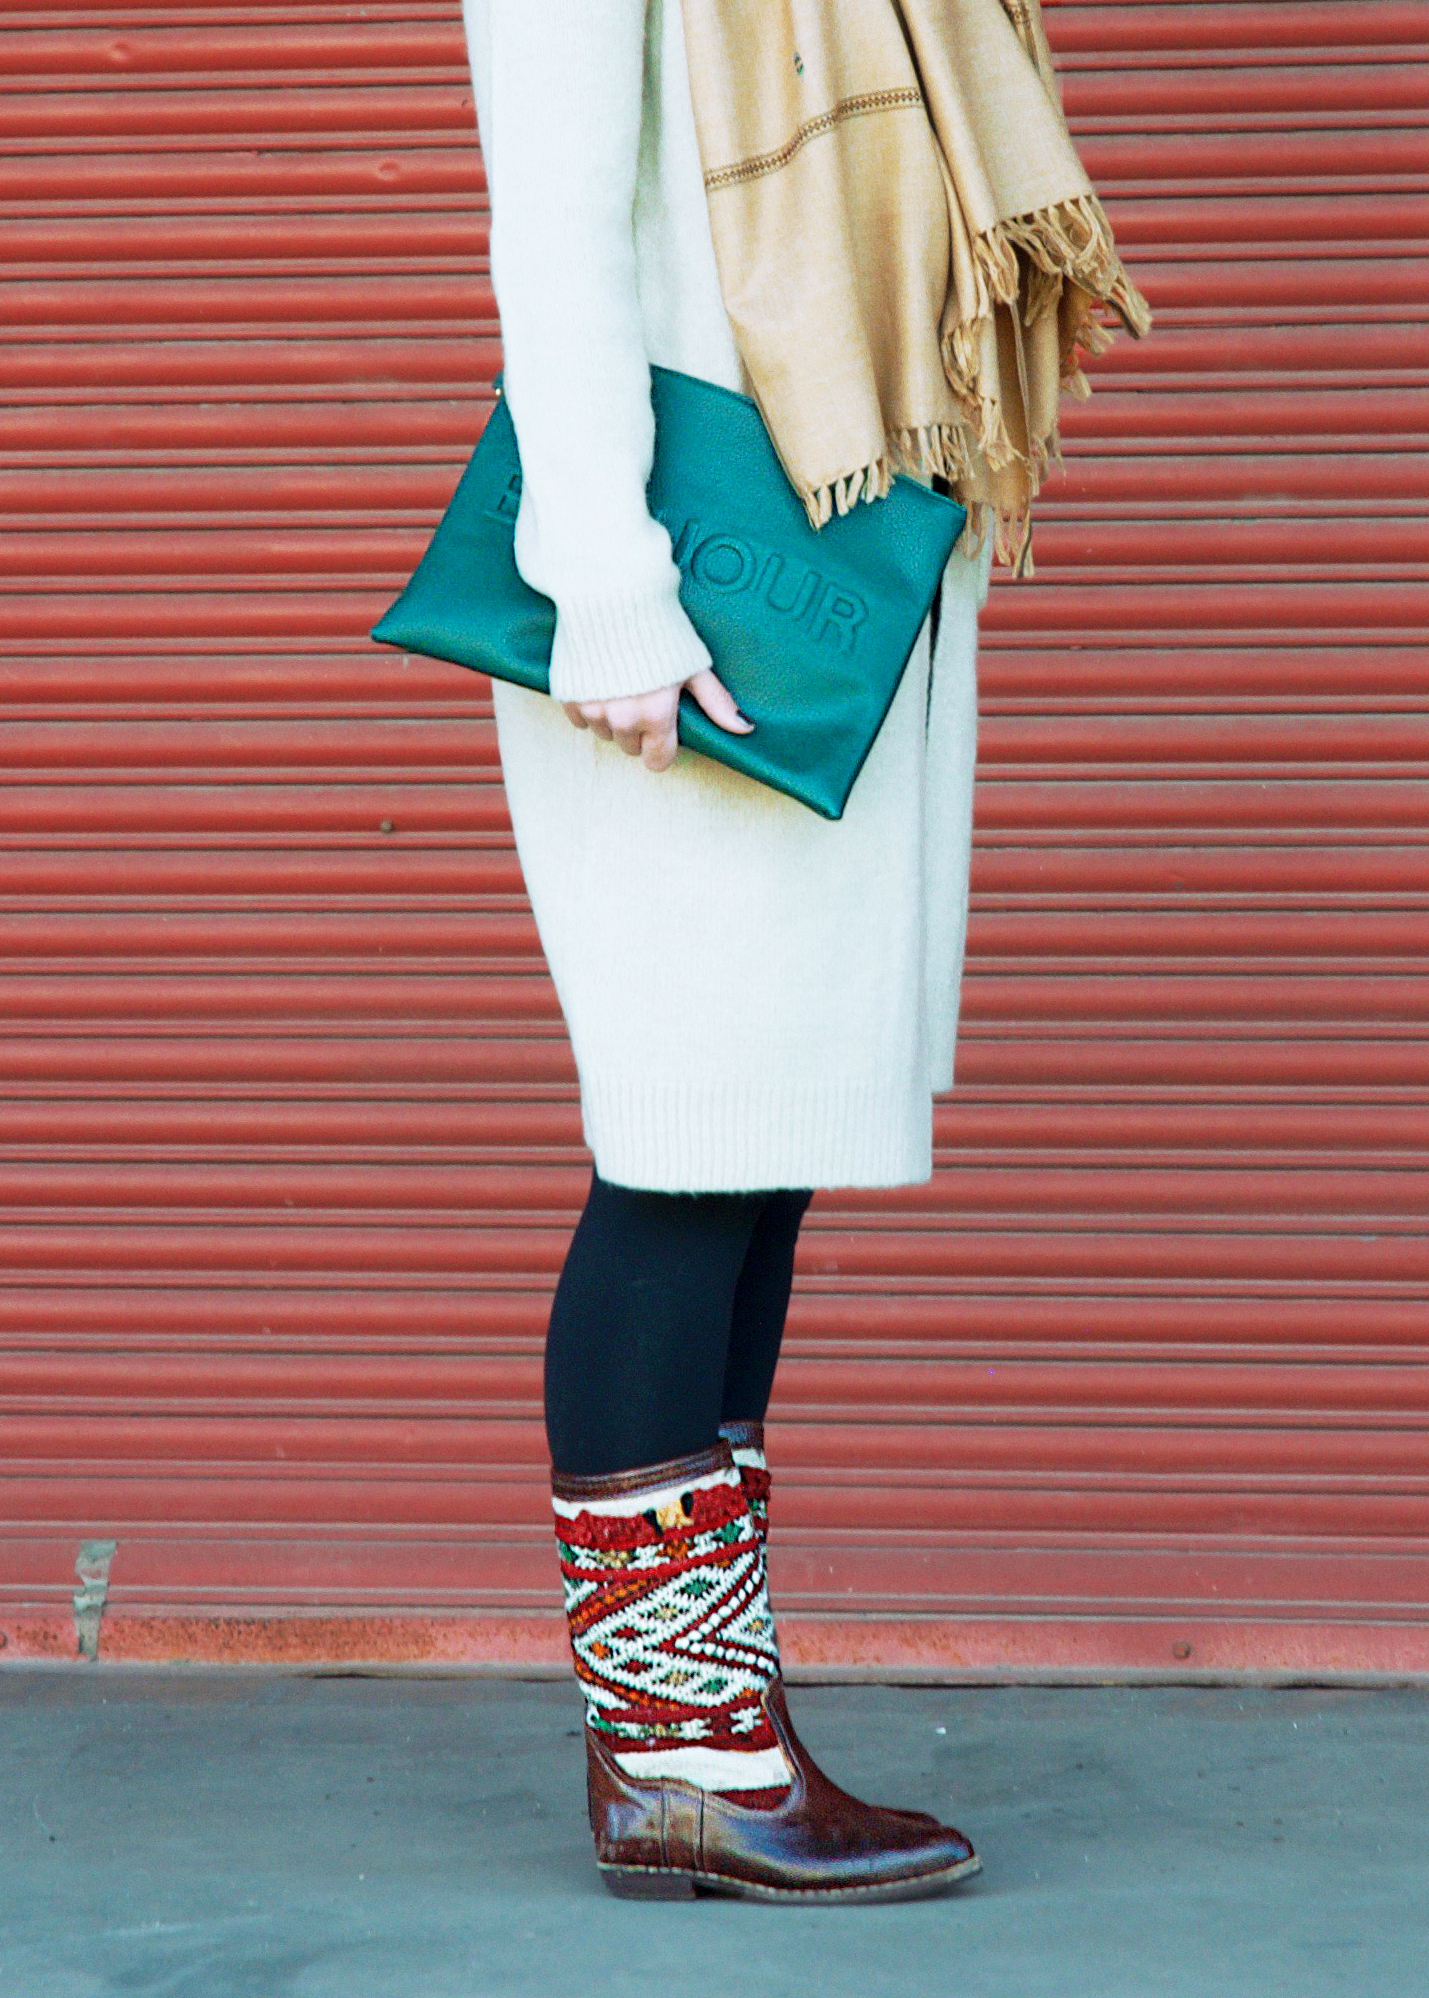 Kilm Boots1.jpg